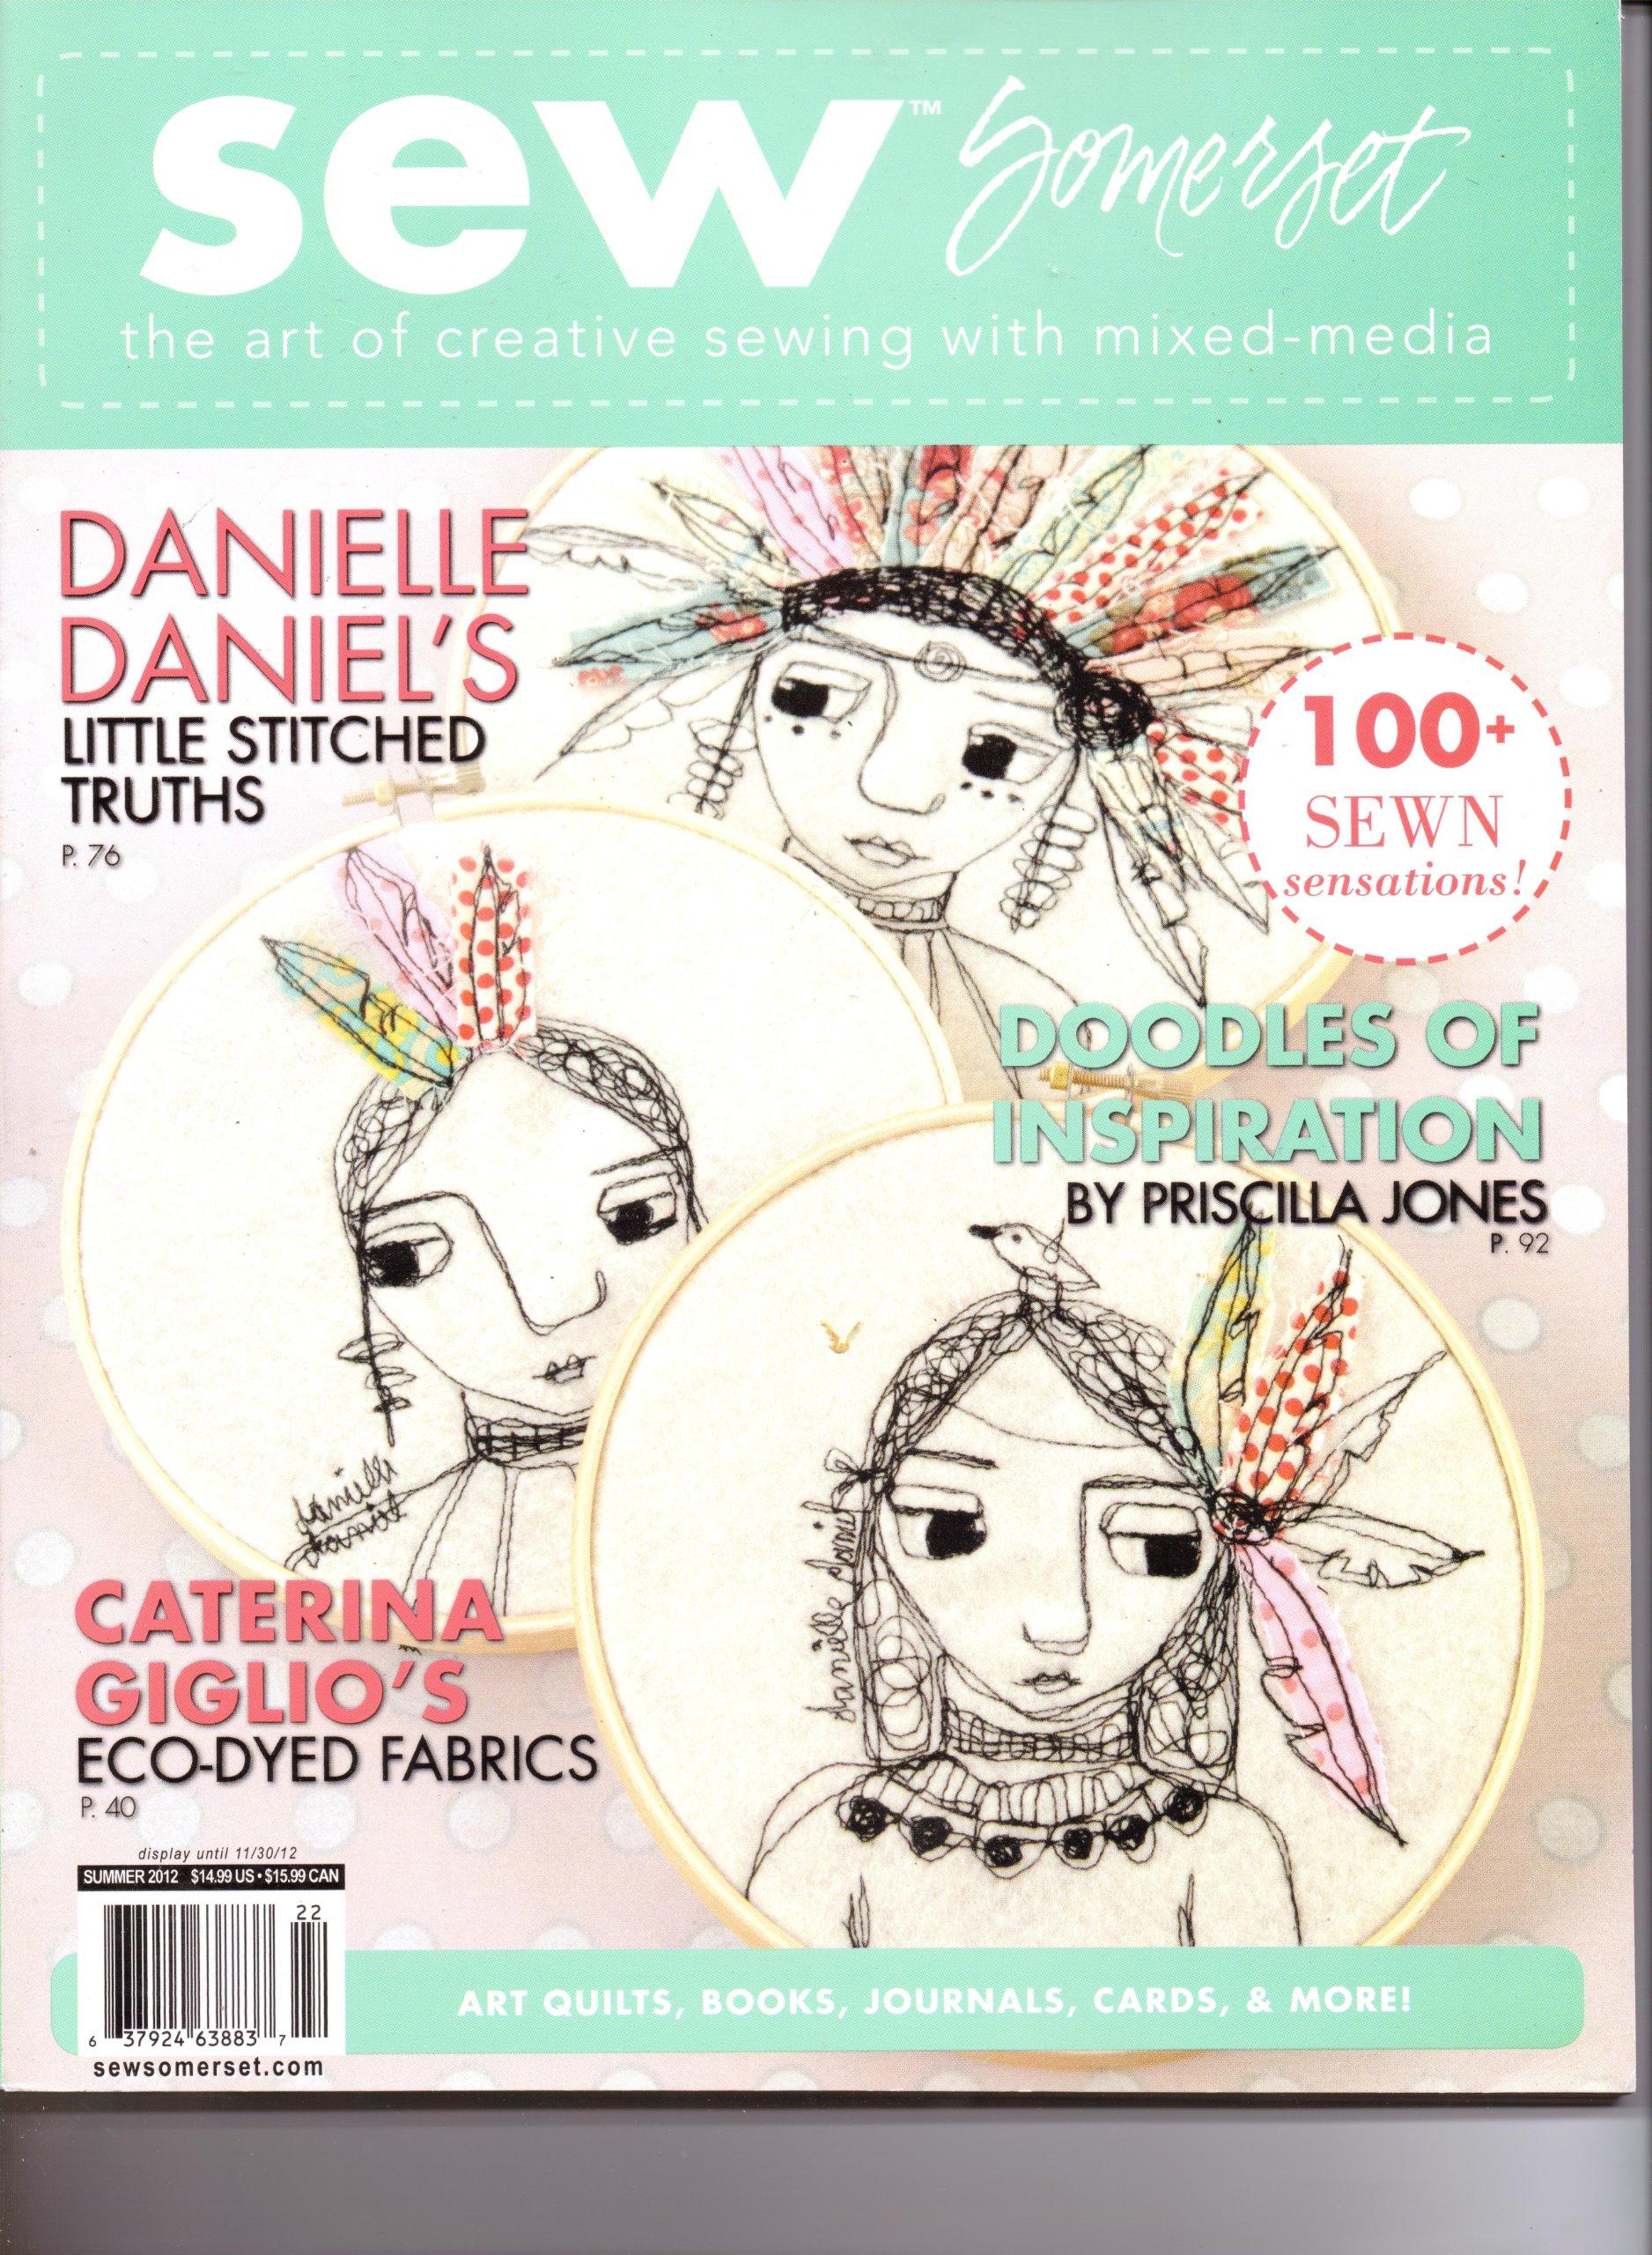 Sew Somerset (Summer 2012, Volume 6 # 1) pdf epub